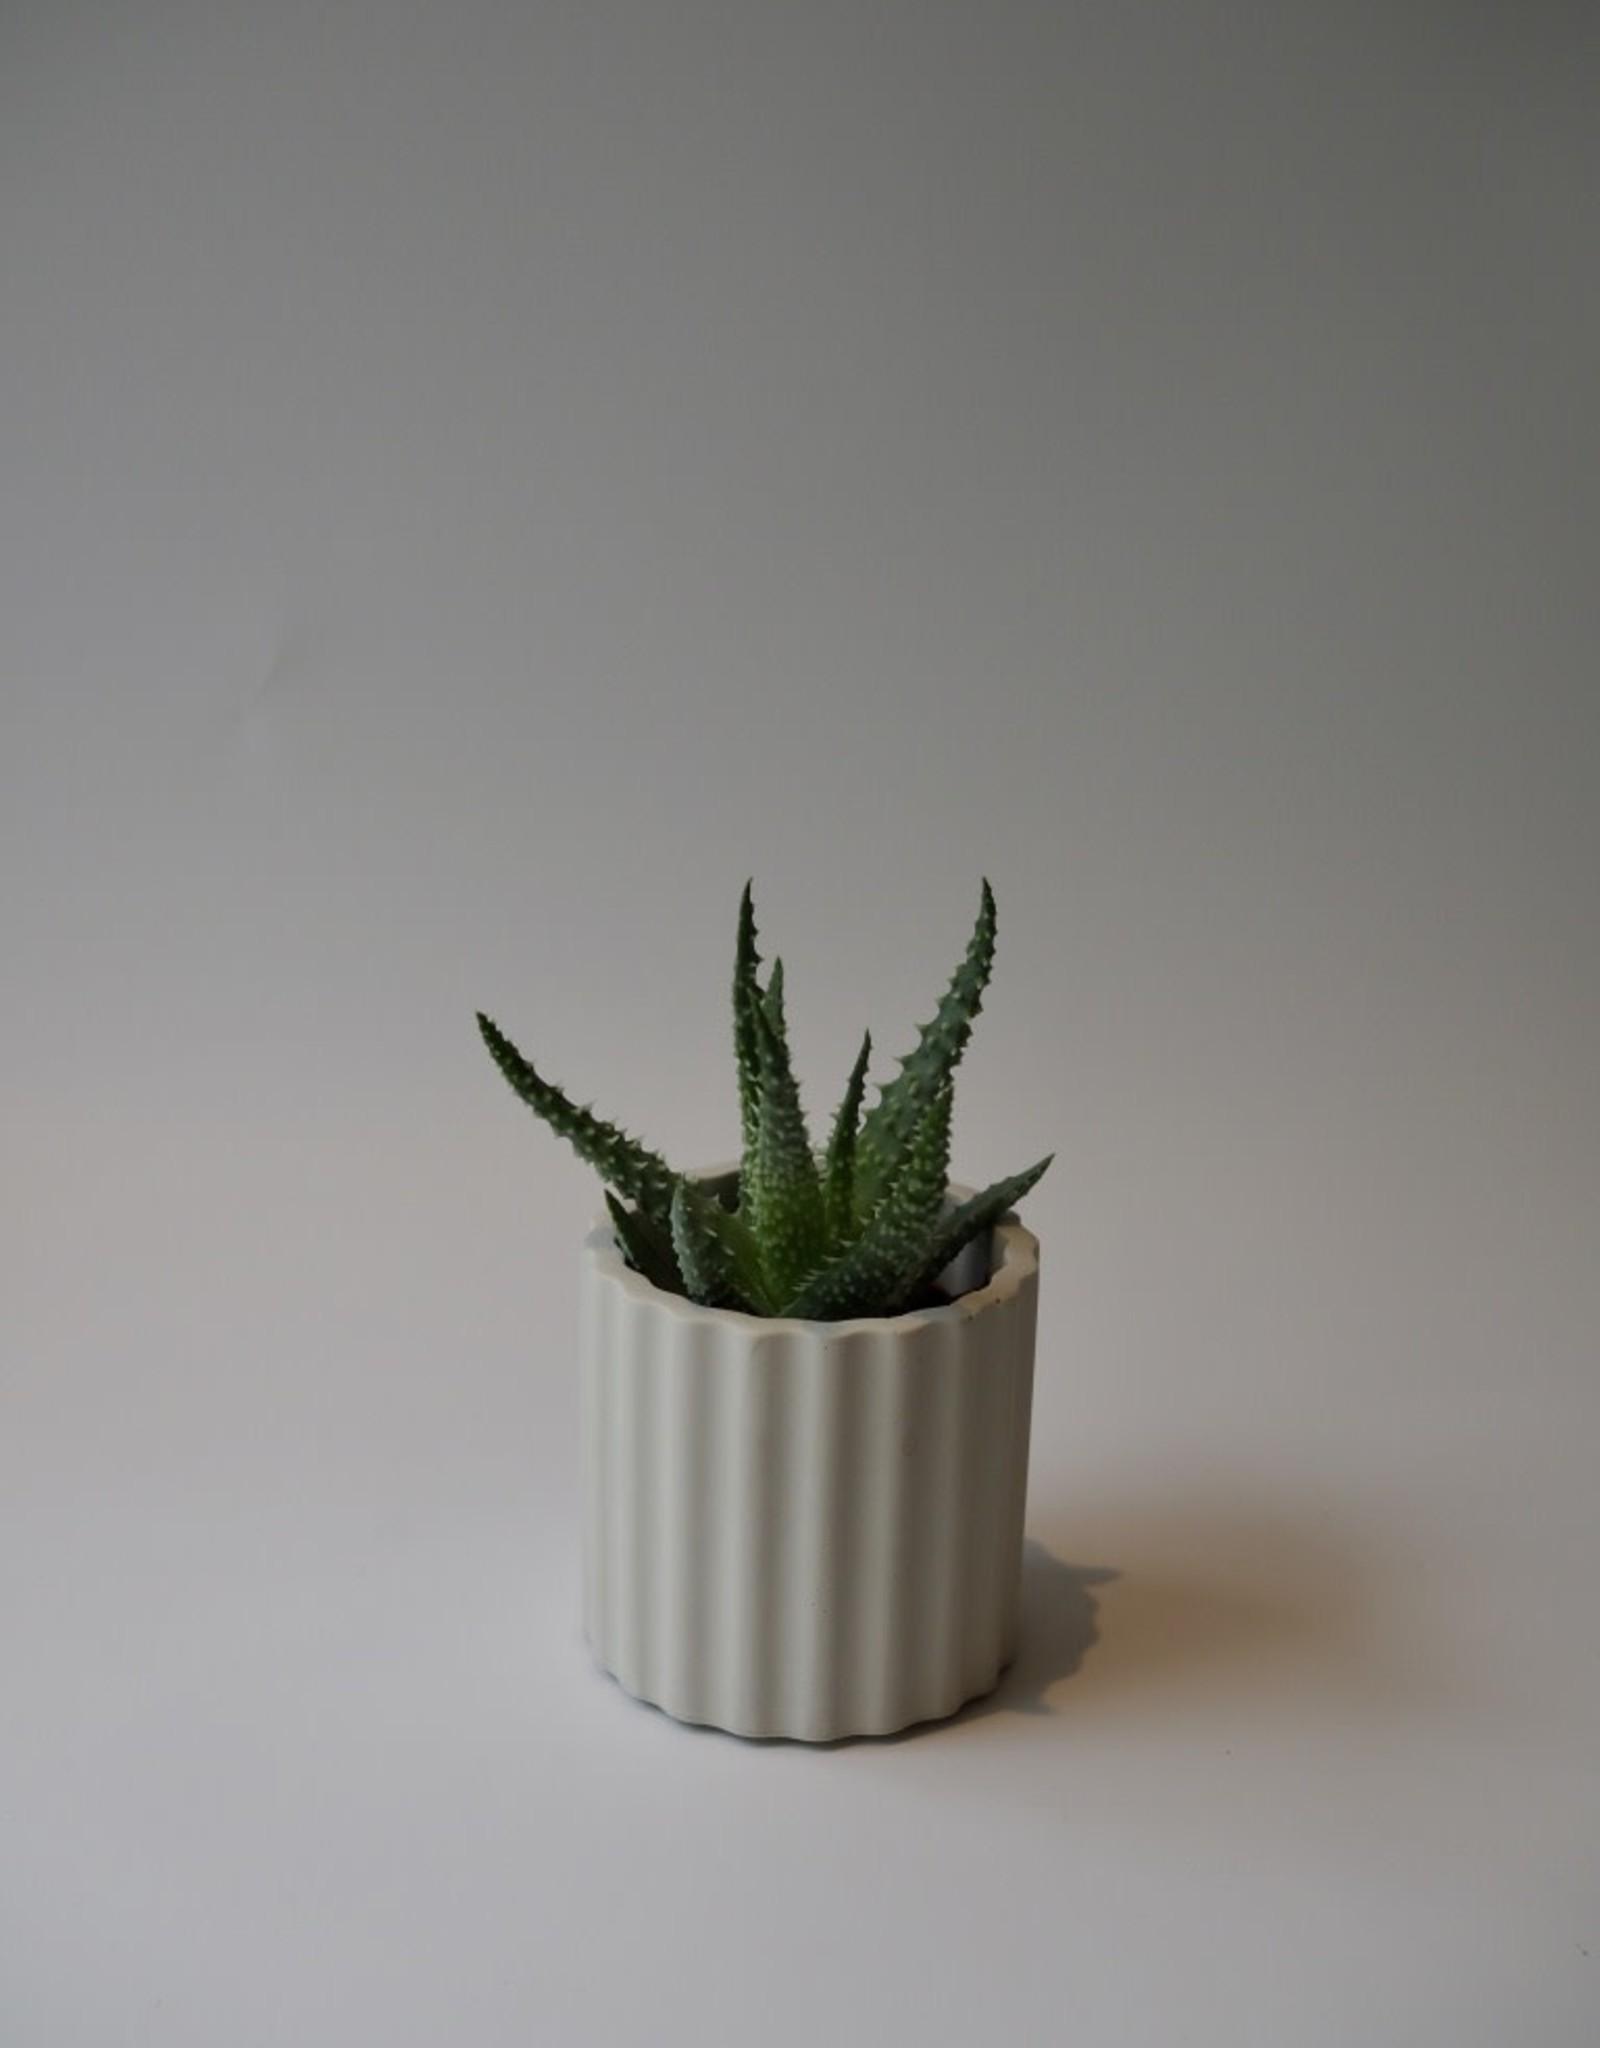 GRUUN Aloe humilis ∅5 h8